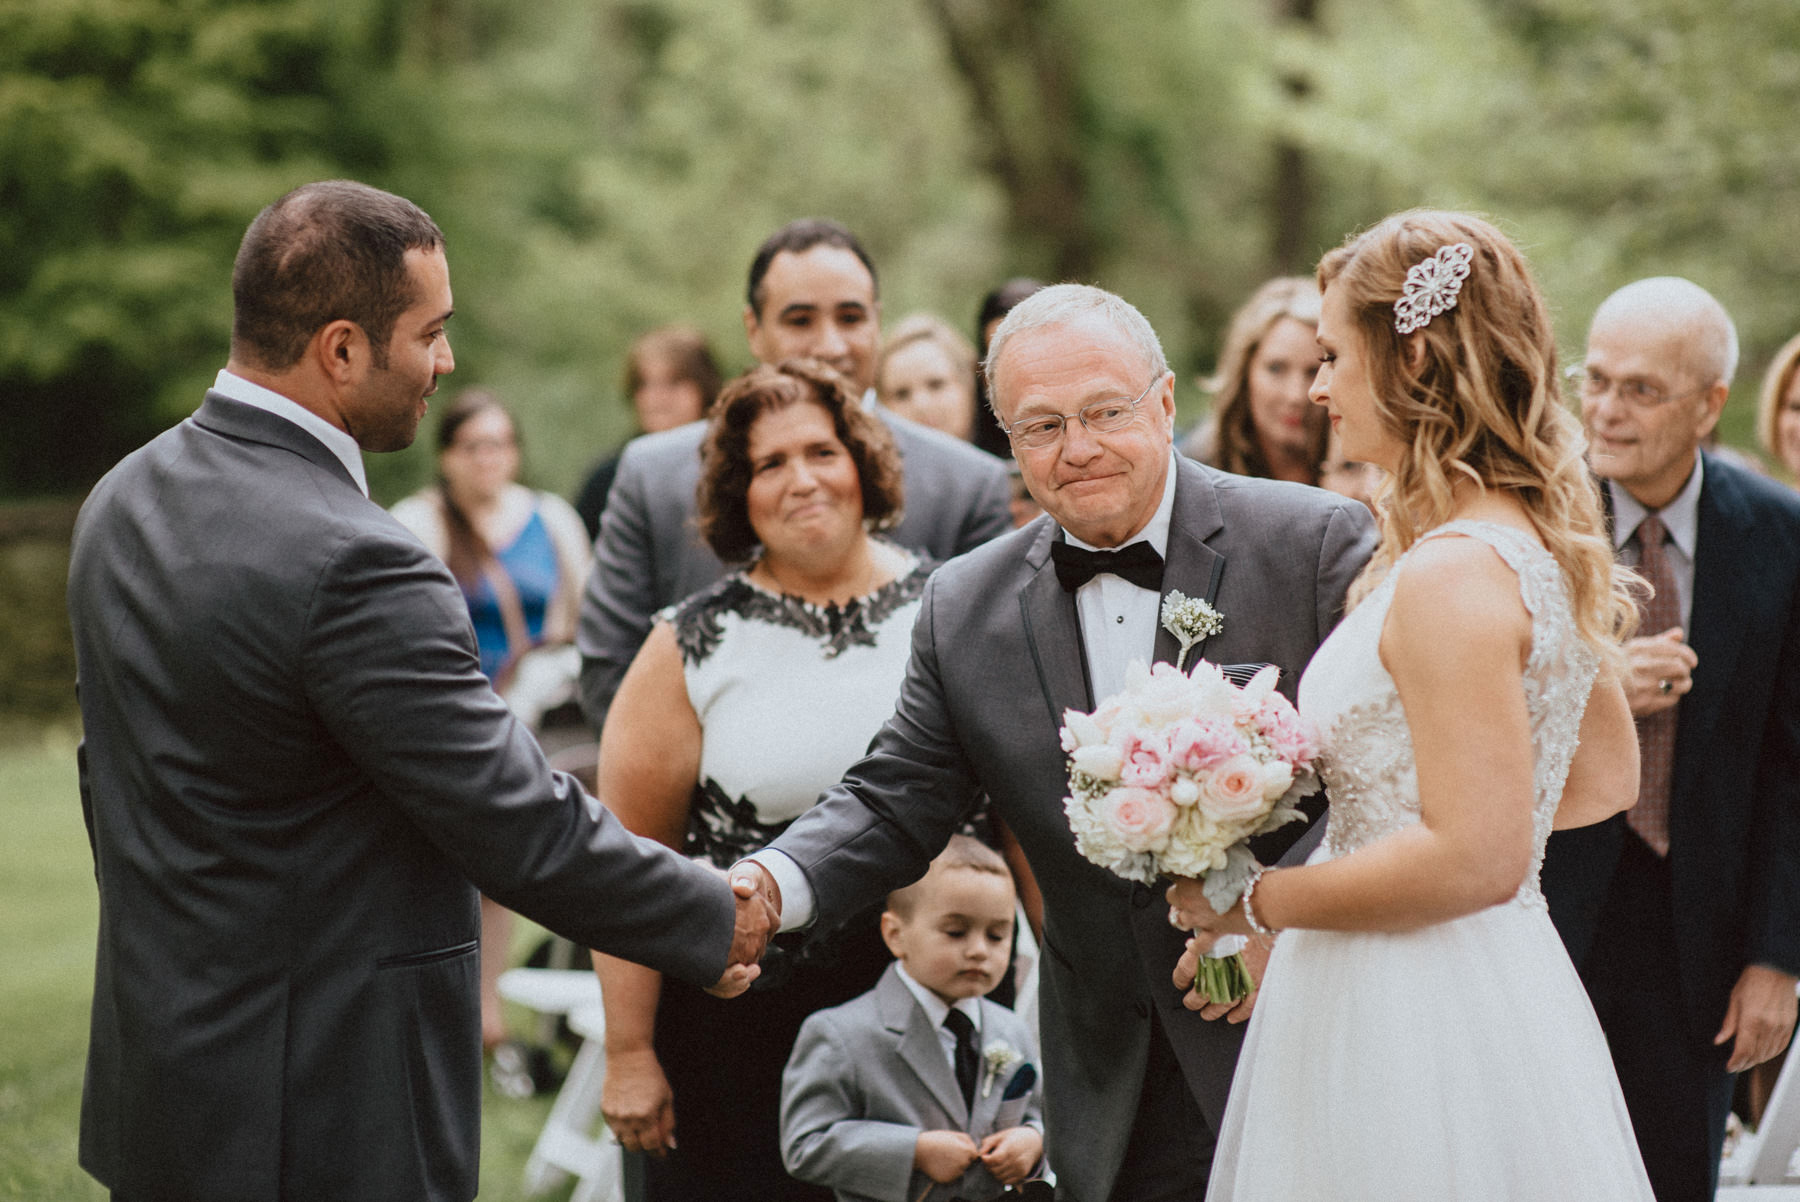 120-appleford-estate-wedding-12.jpg